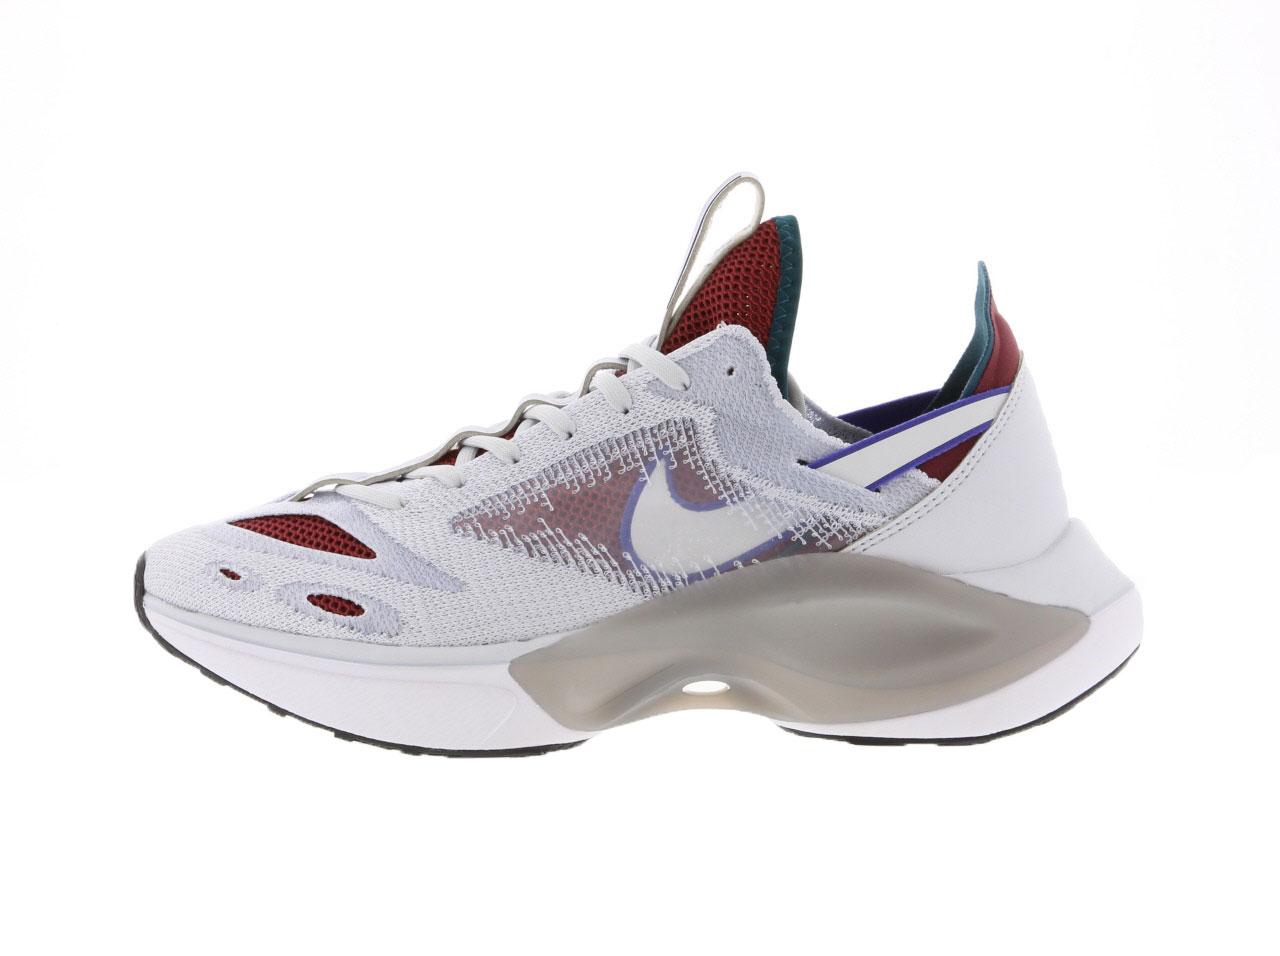 【40%OFF!】NIKE N110 D/MS/X(AT5405-003)【ナイキ】【メンズファッション】【シューズ】【スニーカー】【靴】【フットウェア】【DIMSIX】